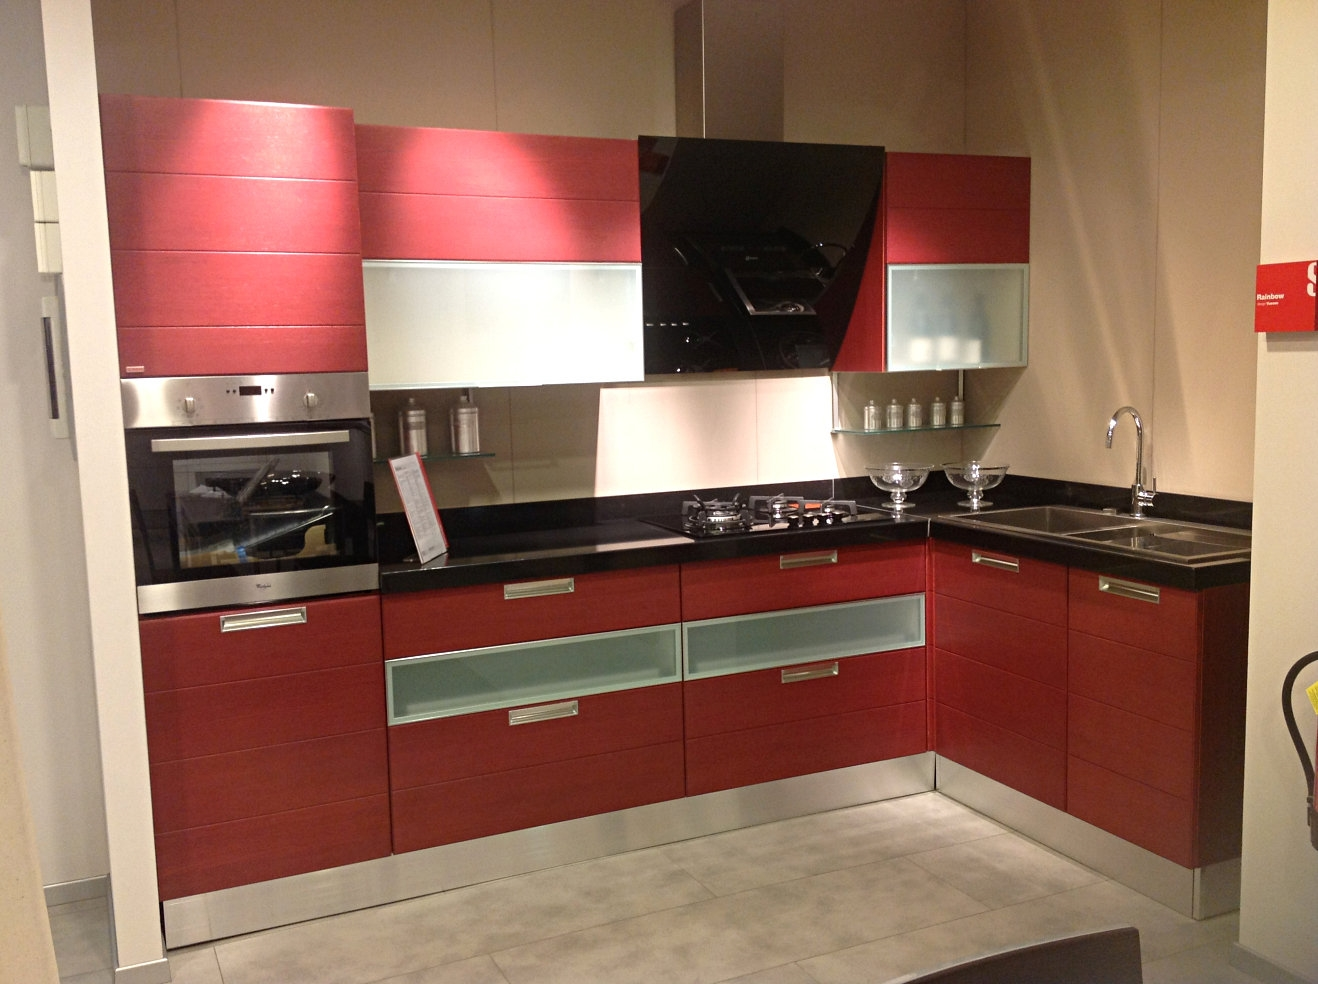 Cucine Scavolini Rainbow : Offerta scavolini rainbow red cucine a prezzi scontati